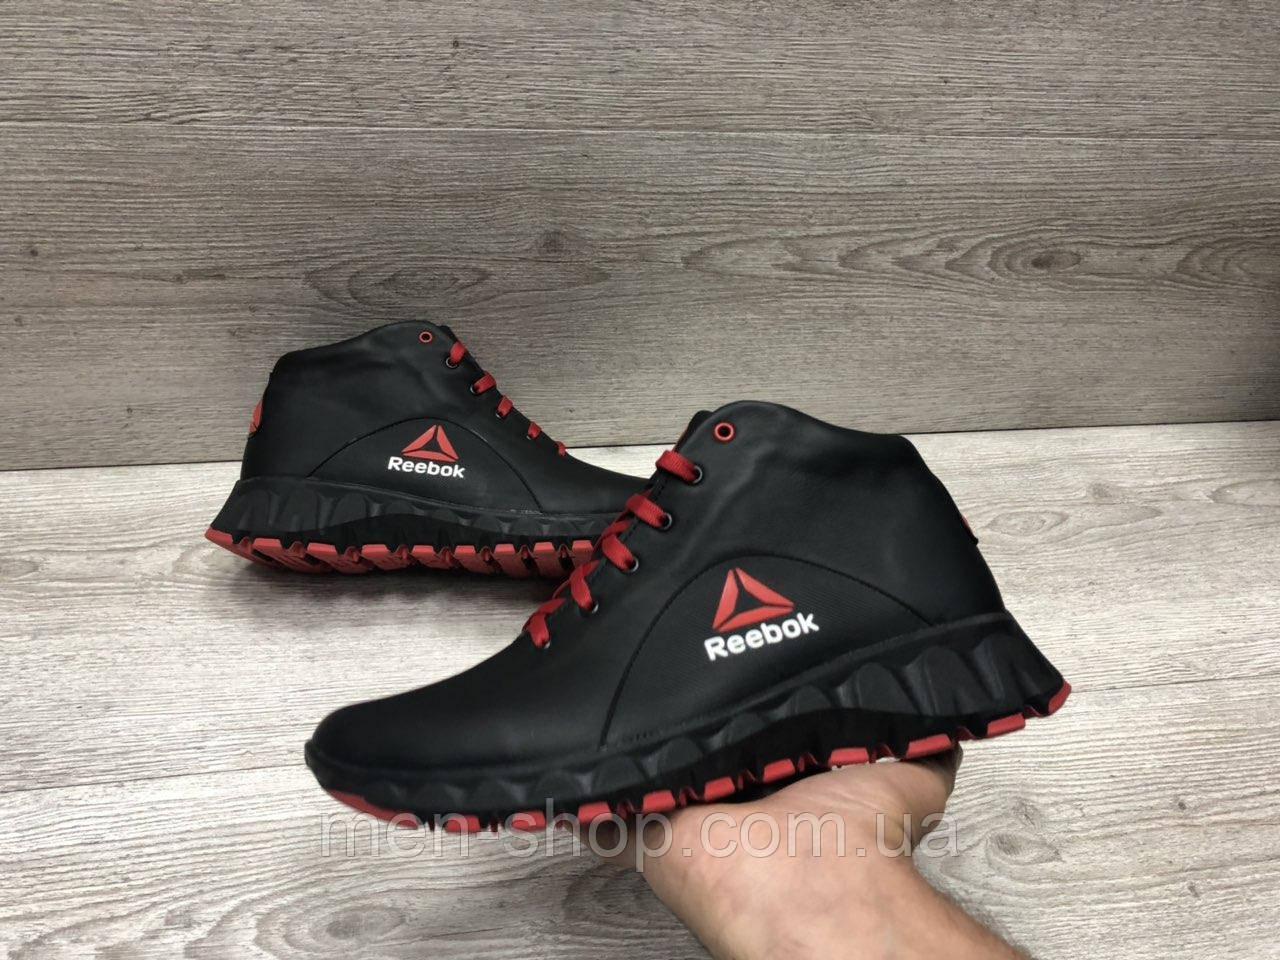 Зимние мужские ботинки в стиле  Reebok